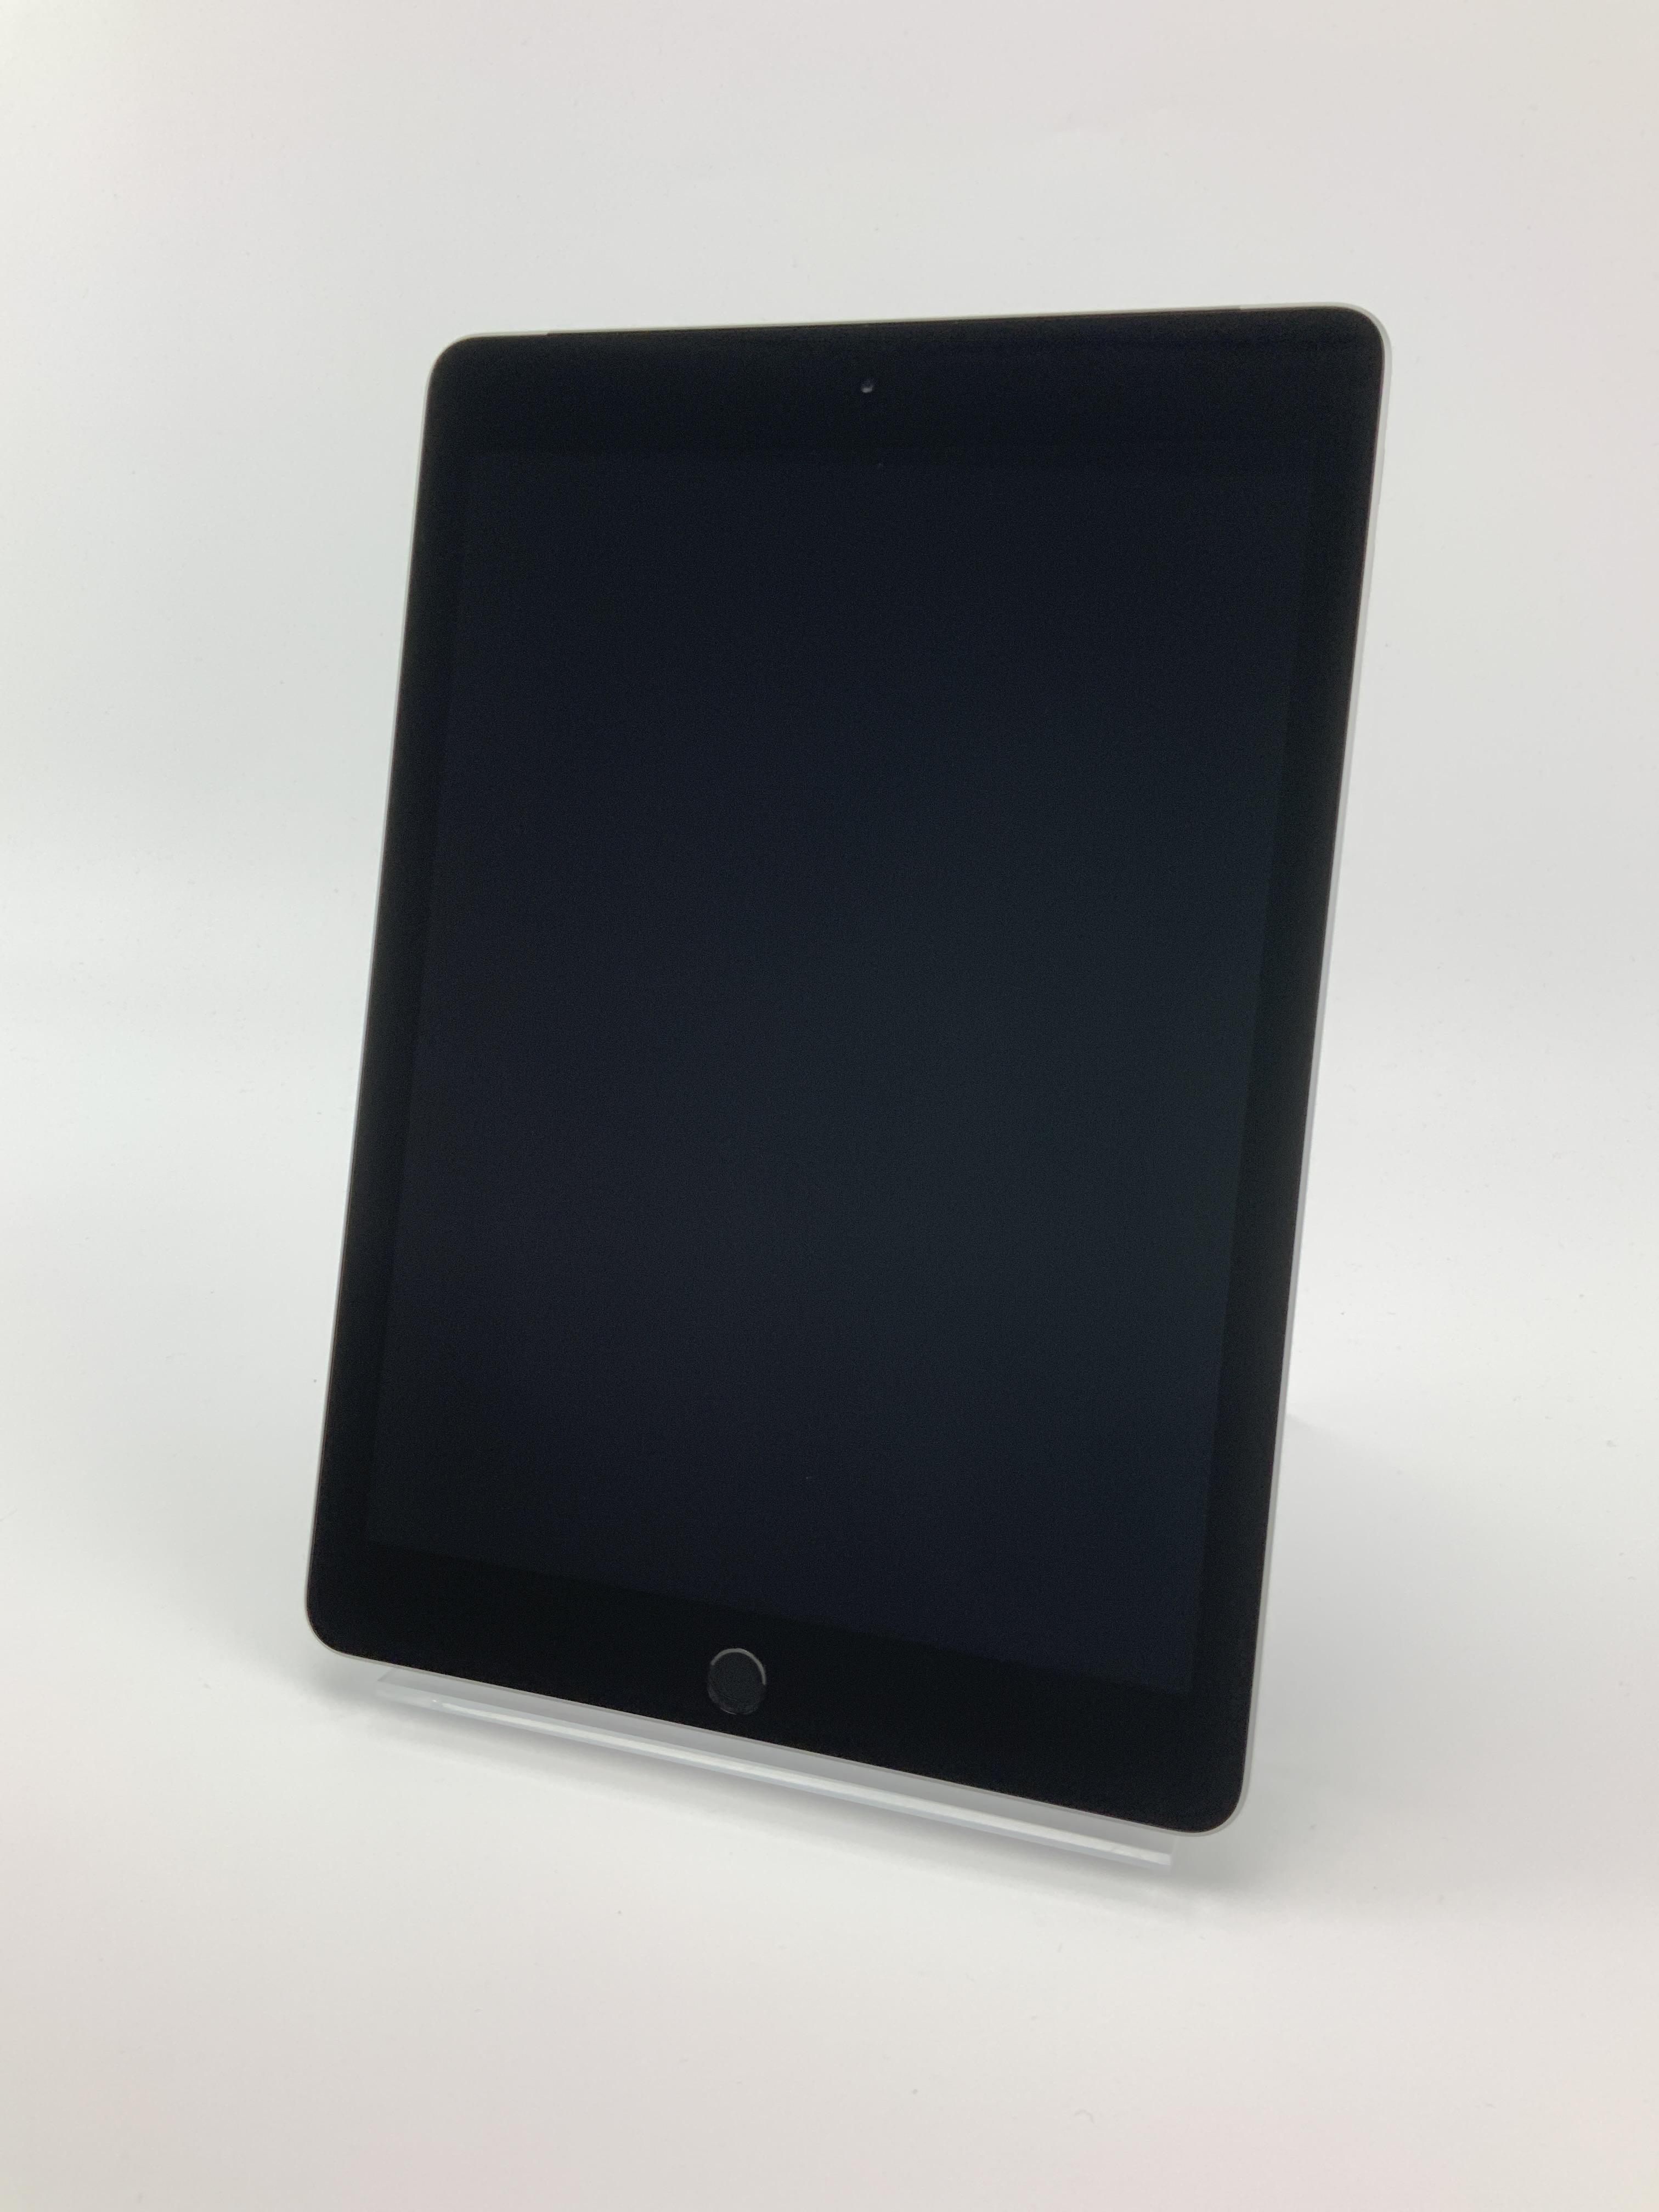 iPad Air 2 Wi-Fi + Cellular 128GB, 128GB, Space Gray, Afbeelding 1